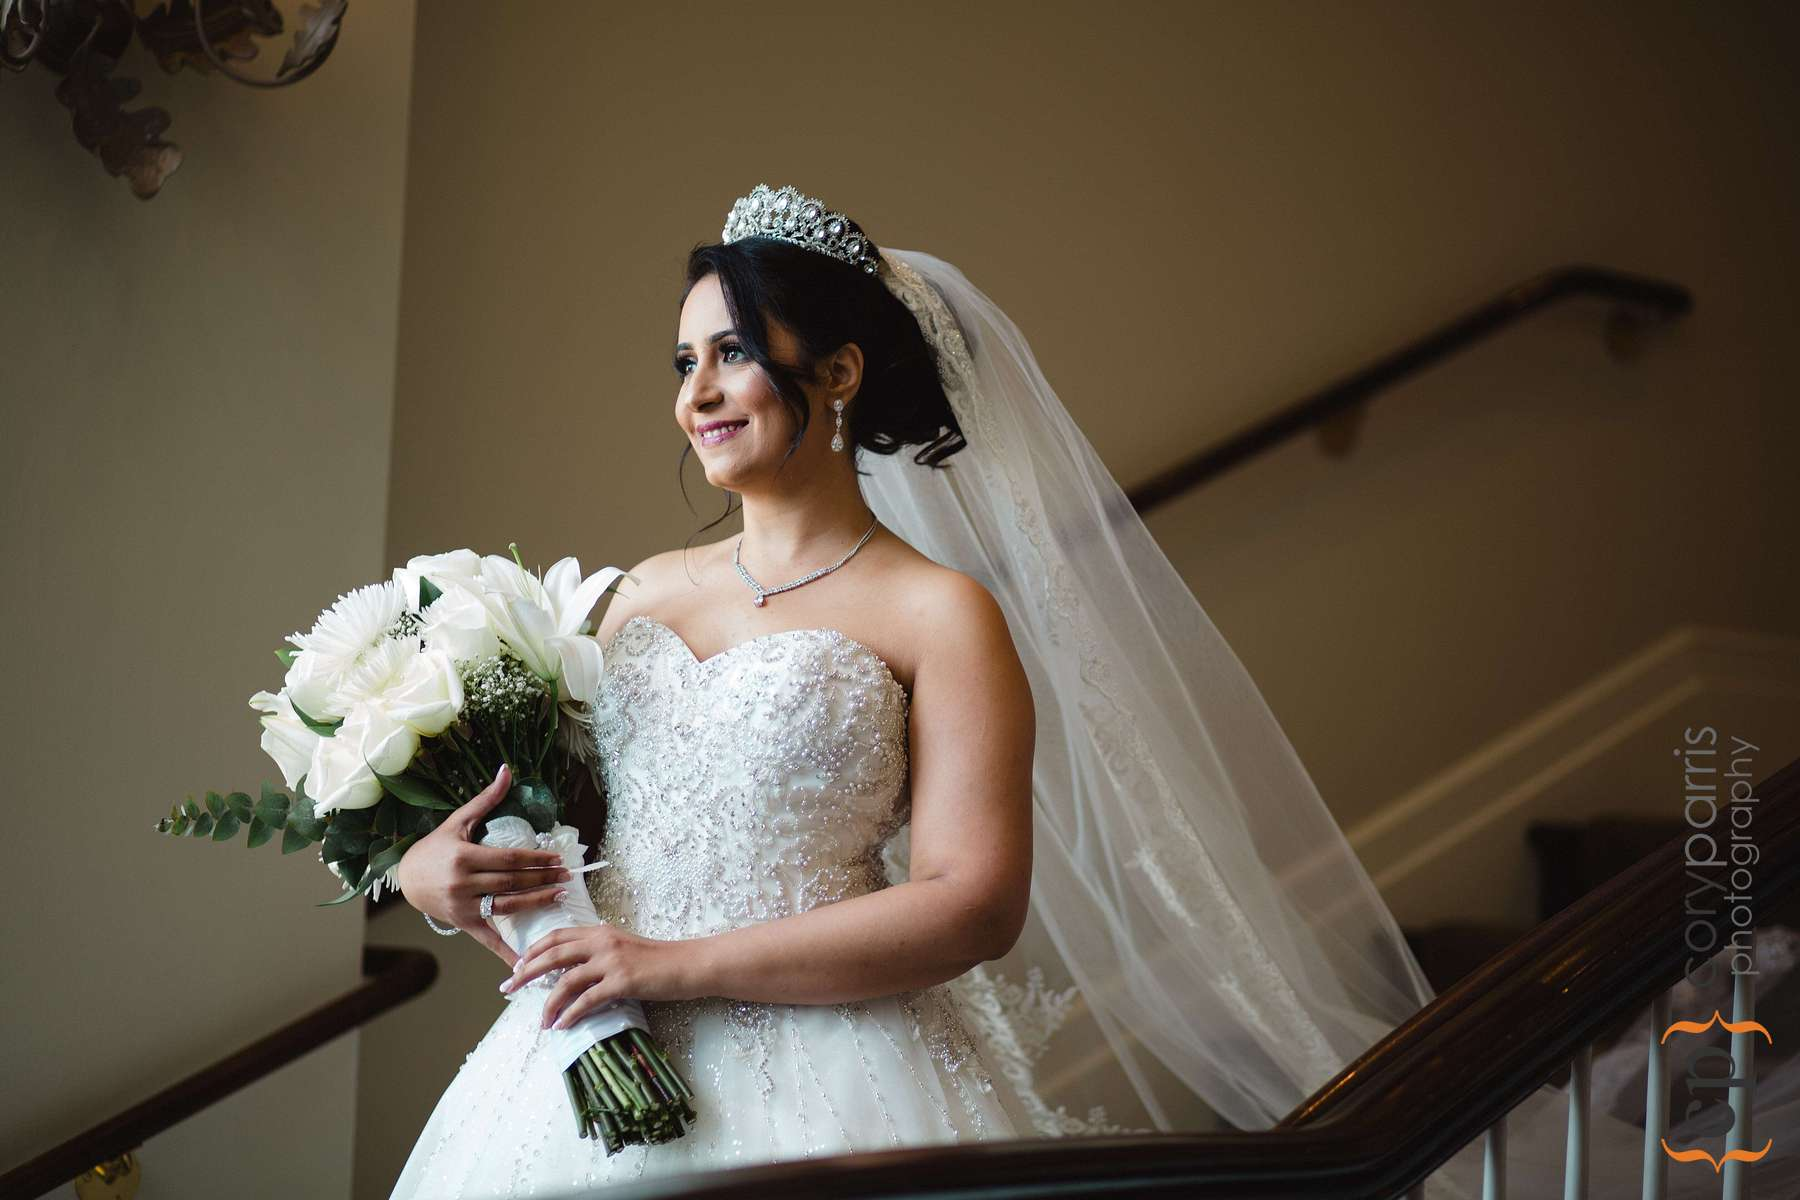 133-woodmark-hotel-wedding-photography.jpg